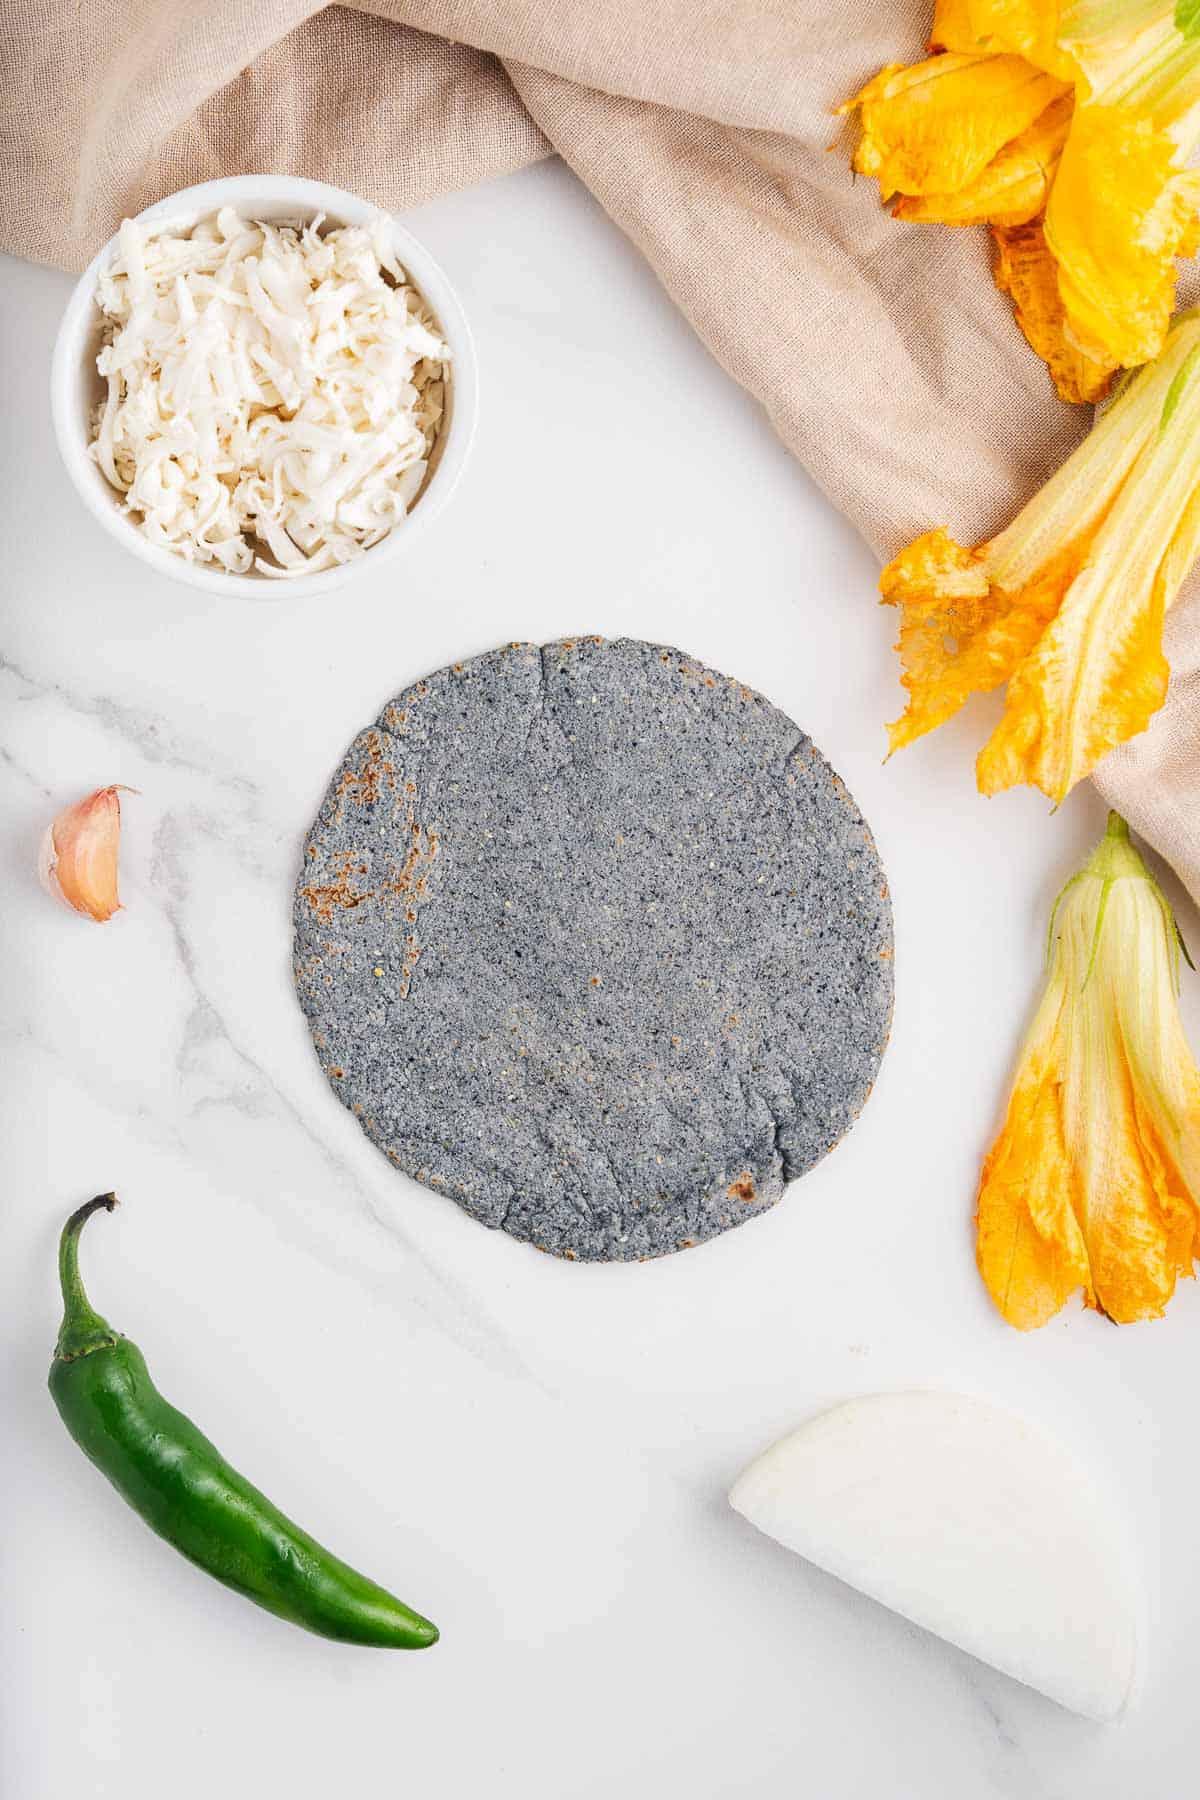 Blue Corn Tortilla, Squash Blossom, Serrano, Garlic, Onion, and Vegan Cheese